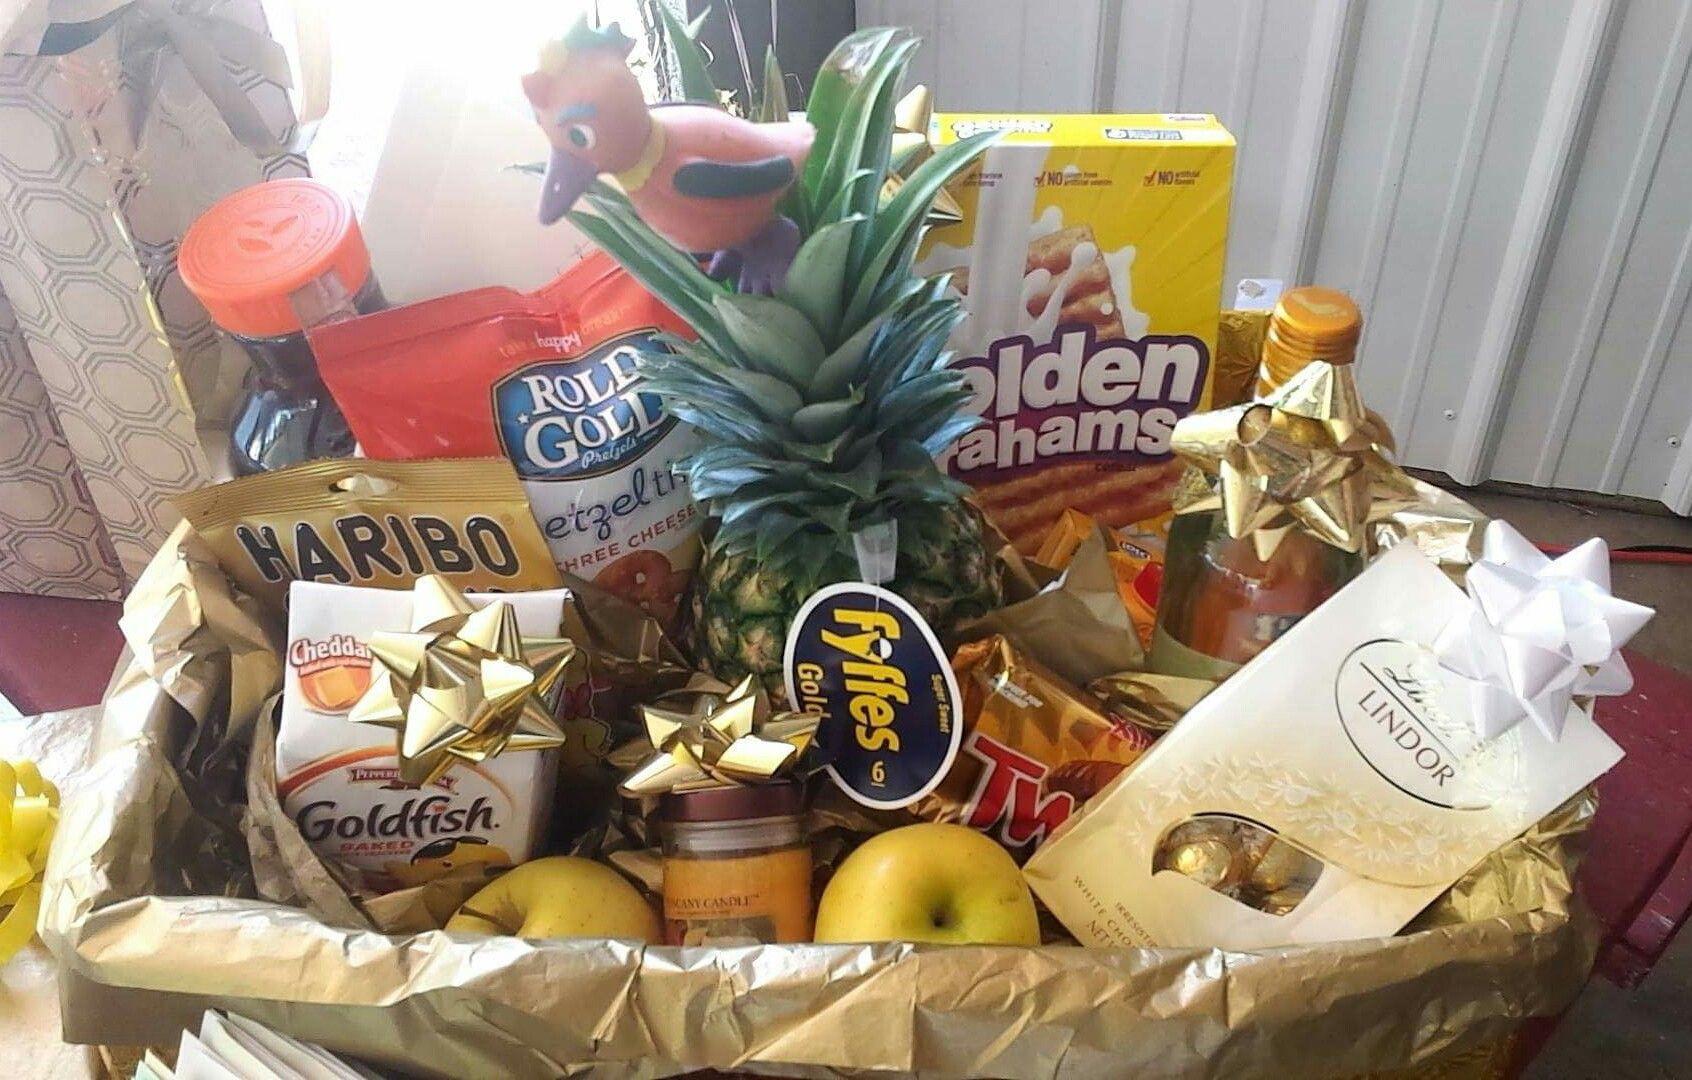 Golden Anniversary Gift Ideas  Golden Gifts for a Golden 50th Anniversary golden